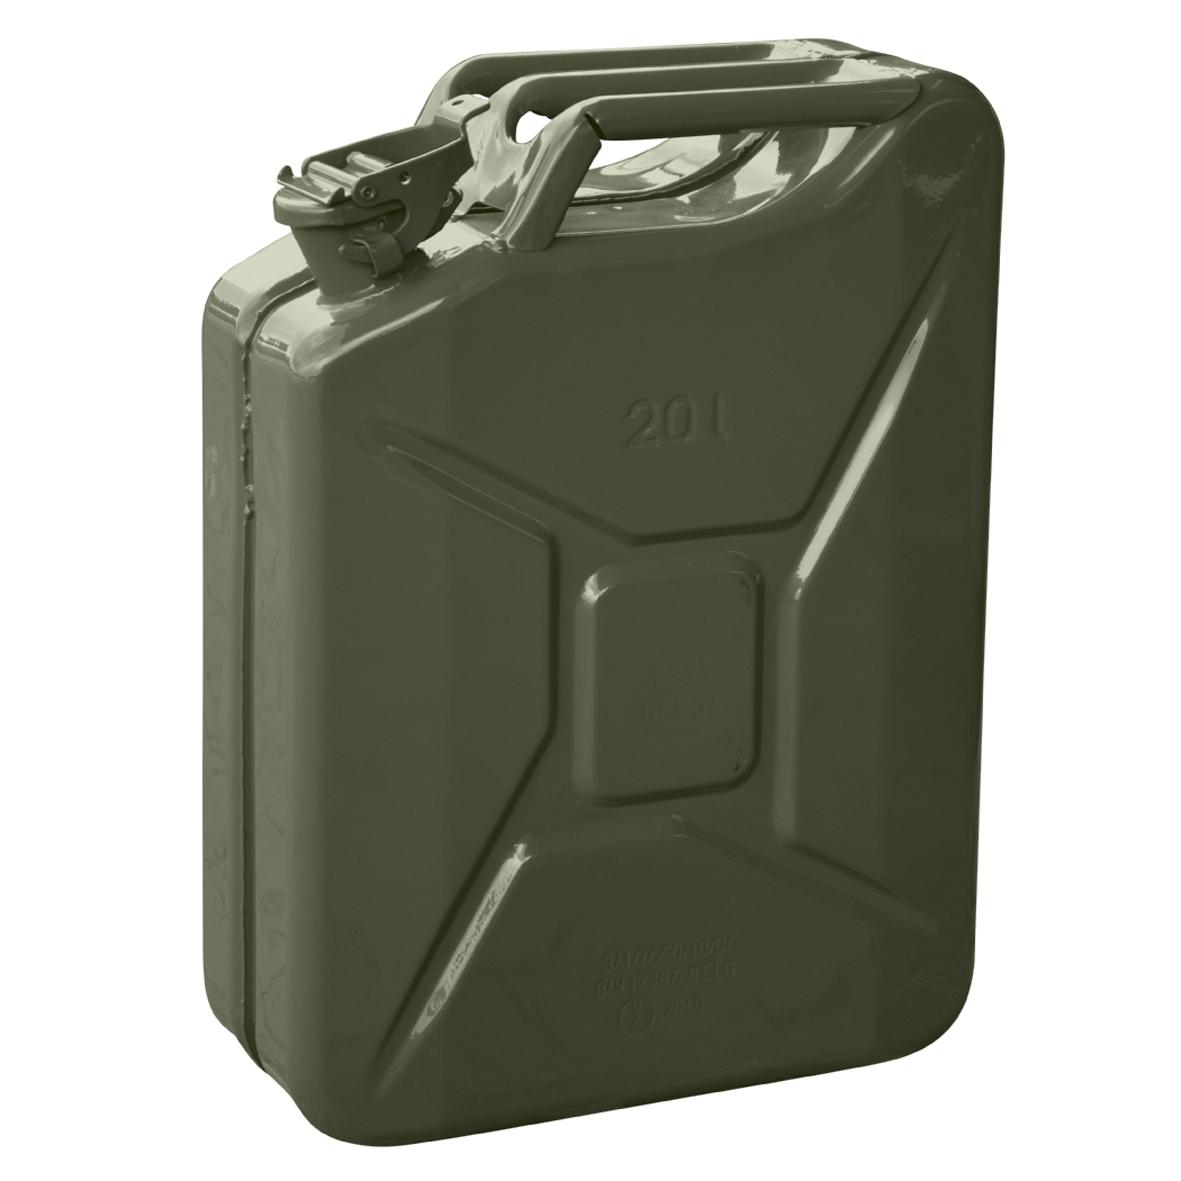 metall benzinkanister un 20 l benzin stahlblech kanister oliv reservekanister ebay. Black Bedroom Furniture Sets. Home Design Ideas